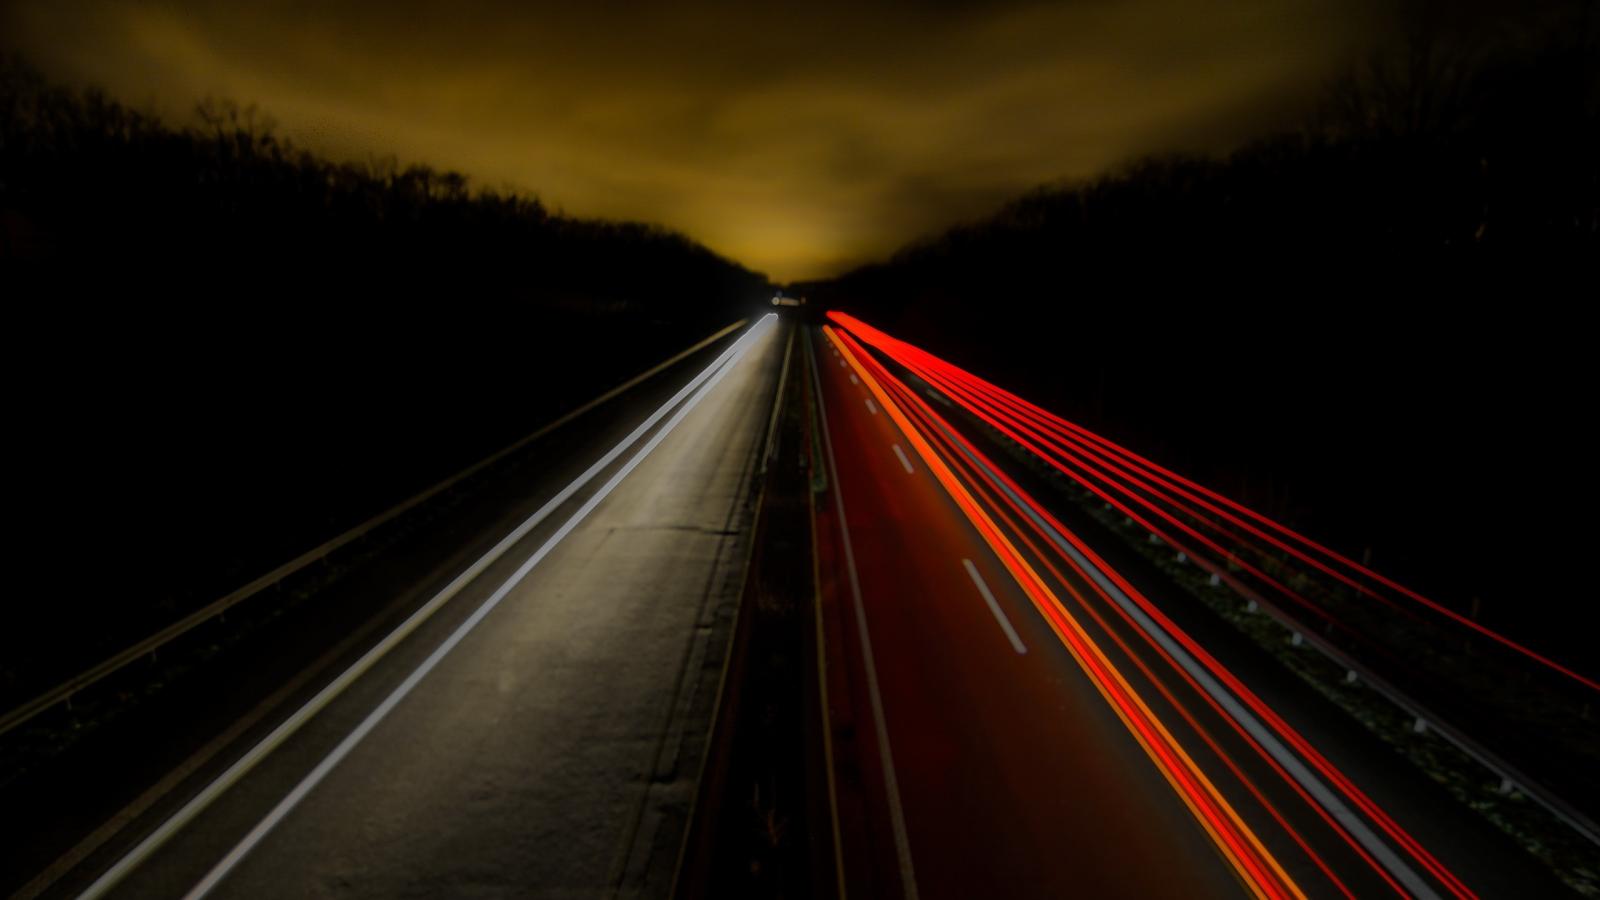 Time-lapse Night Road, Full HD 2K Wallpaper